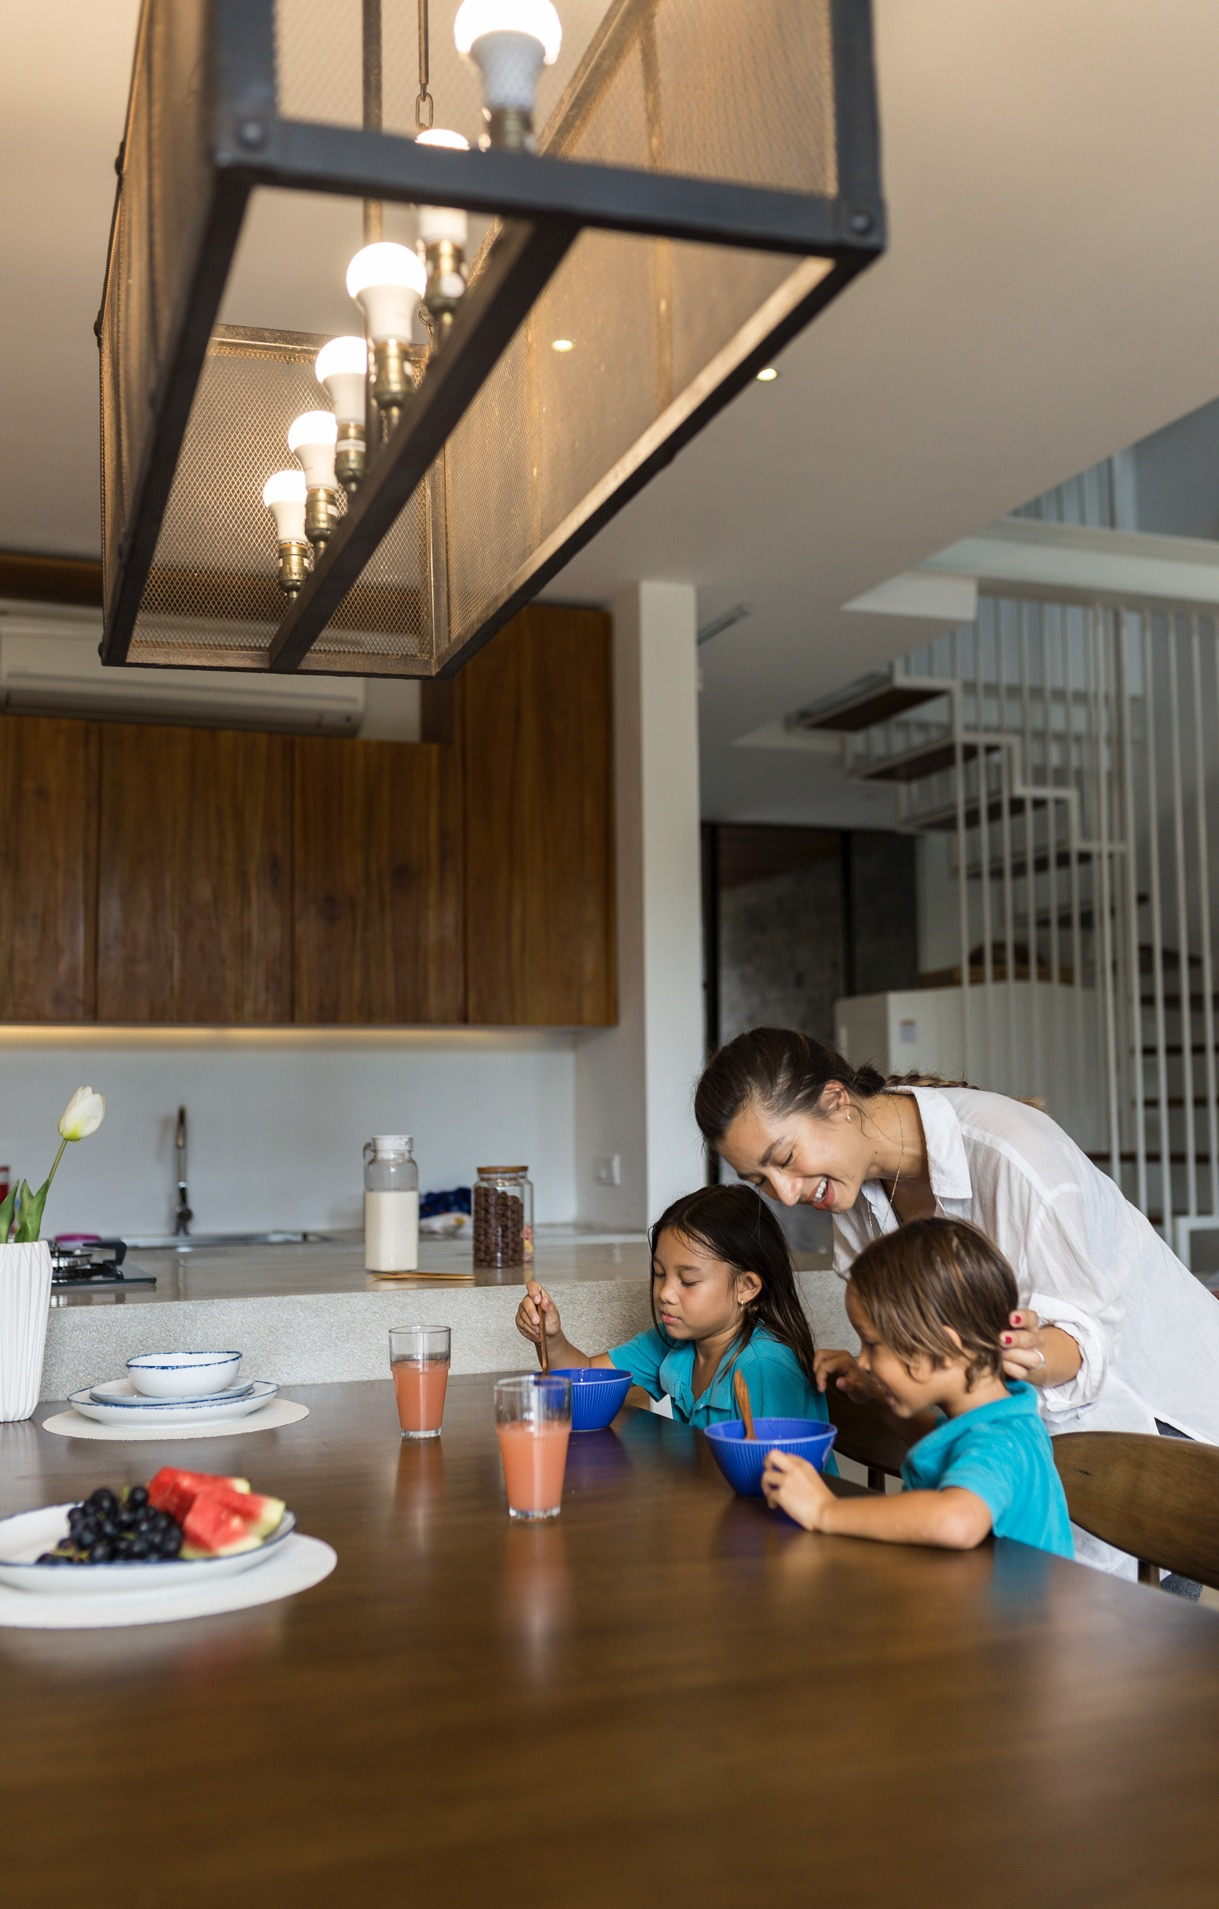 Ruang Makan Rumah Baru Keluarga Bachdim - Meja Makan Summit